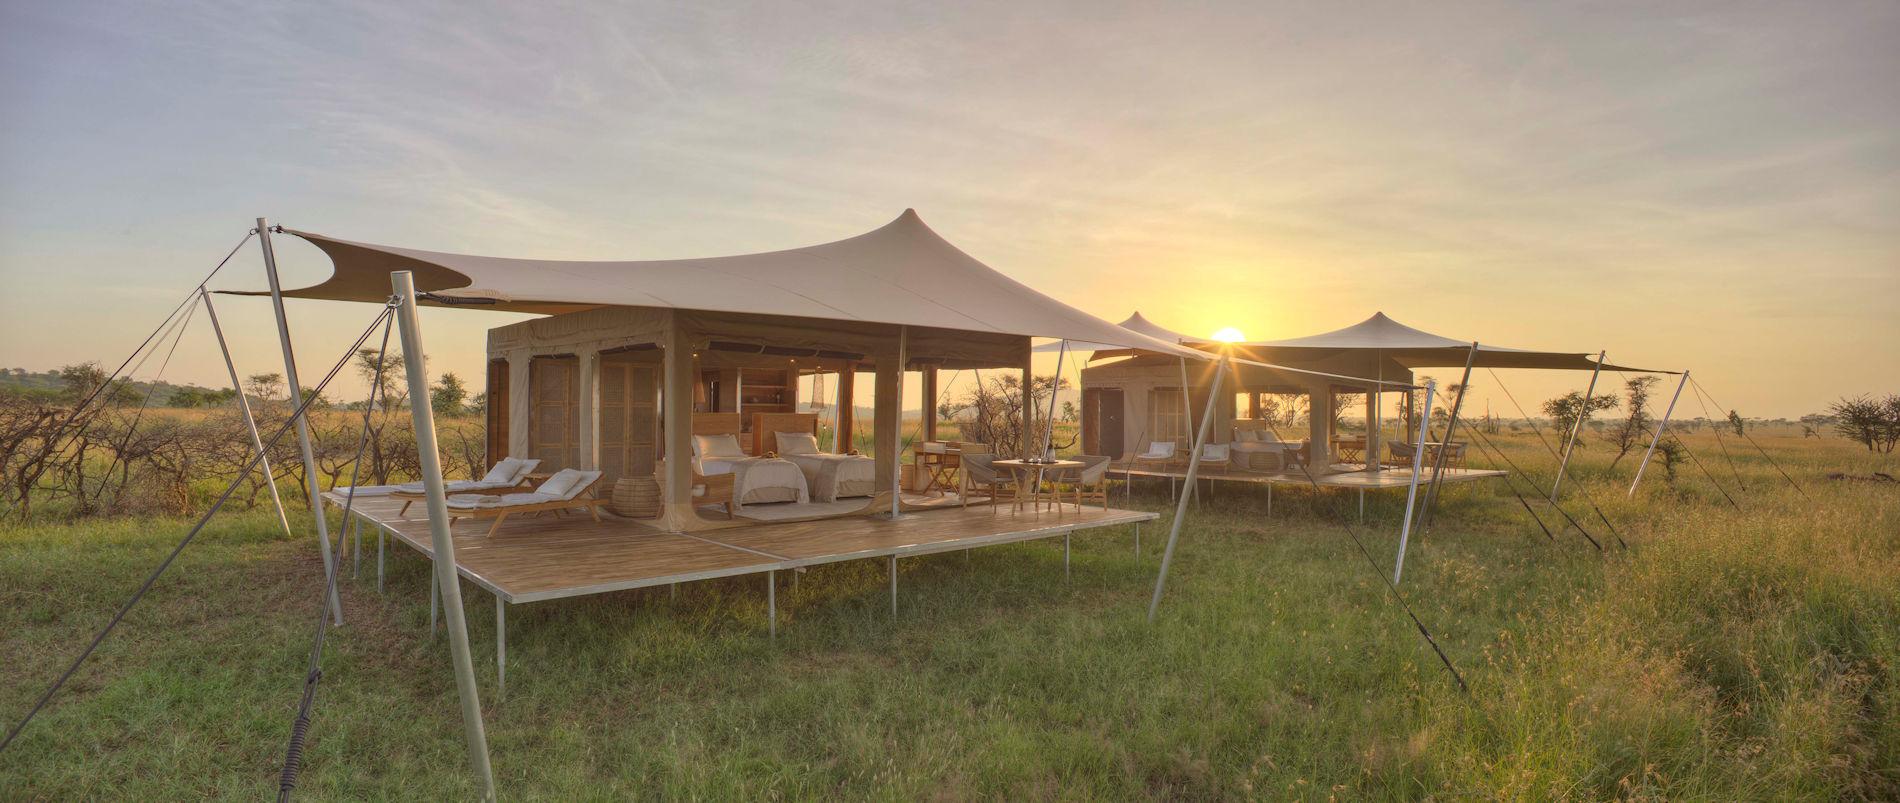 Zelte, Roving Bushtops Serengeti, Tansania